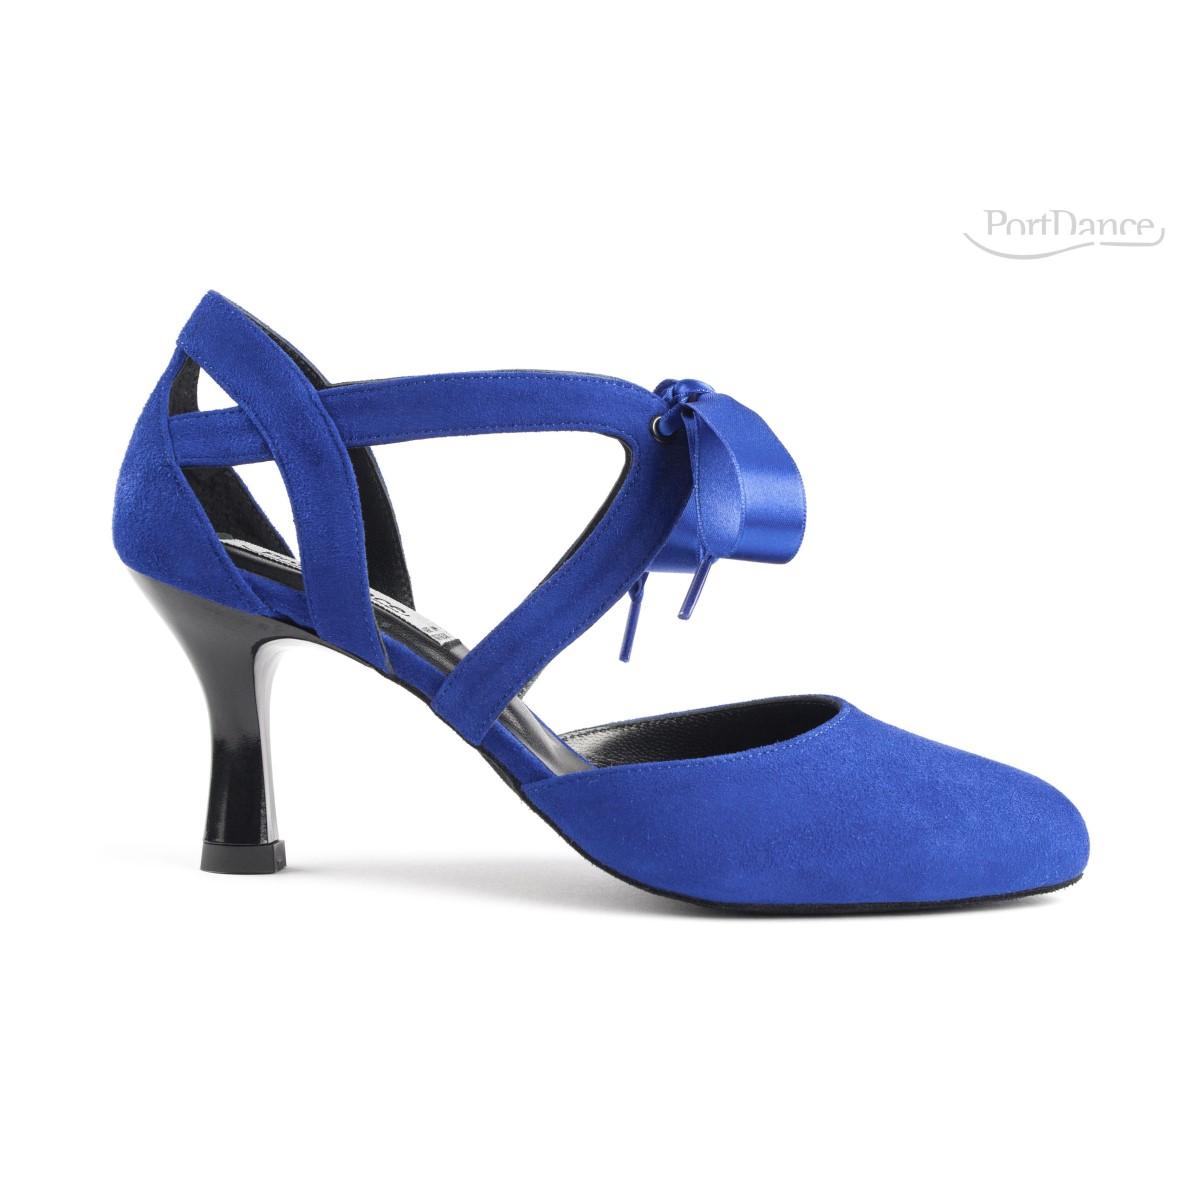 Chaussures Premium Portdance PD125